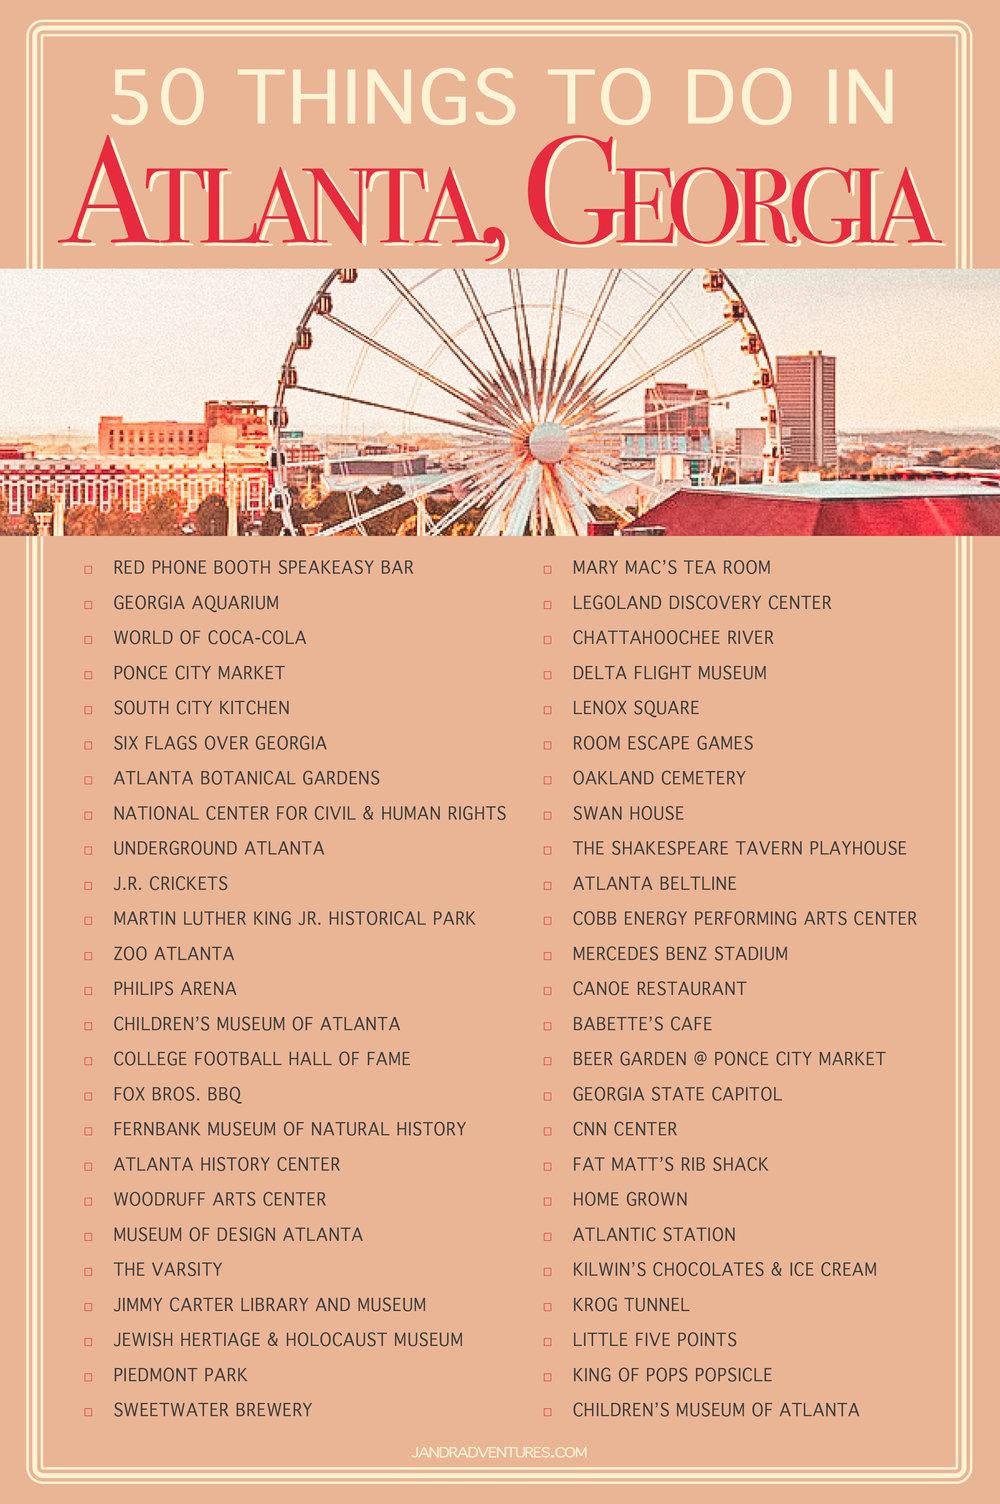 50 Things in Atlanta v2.jpg